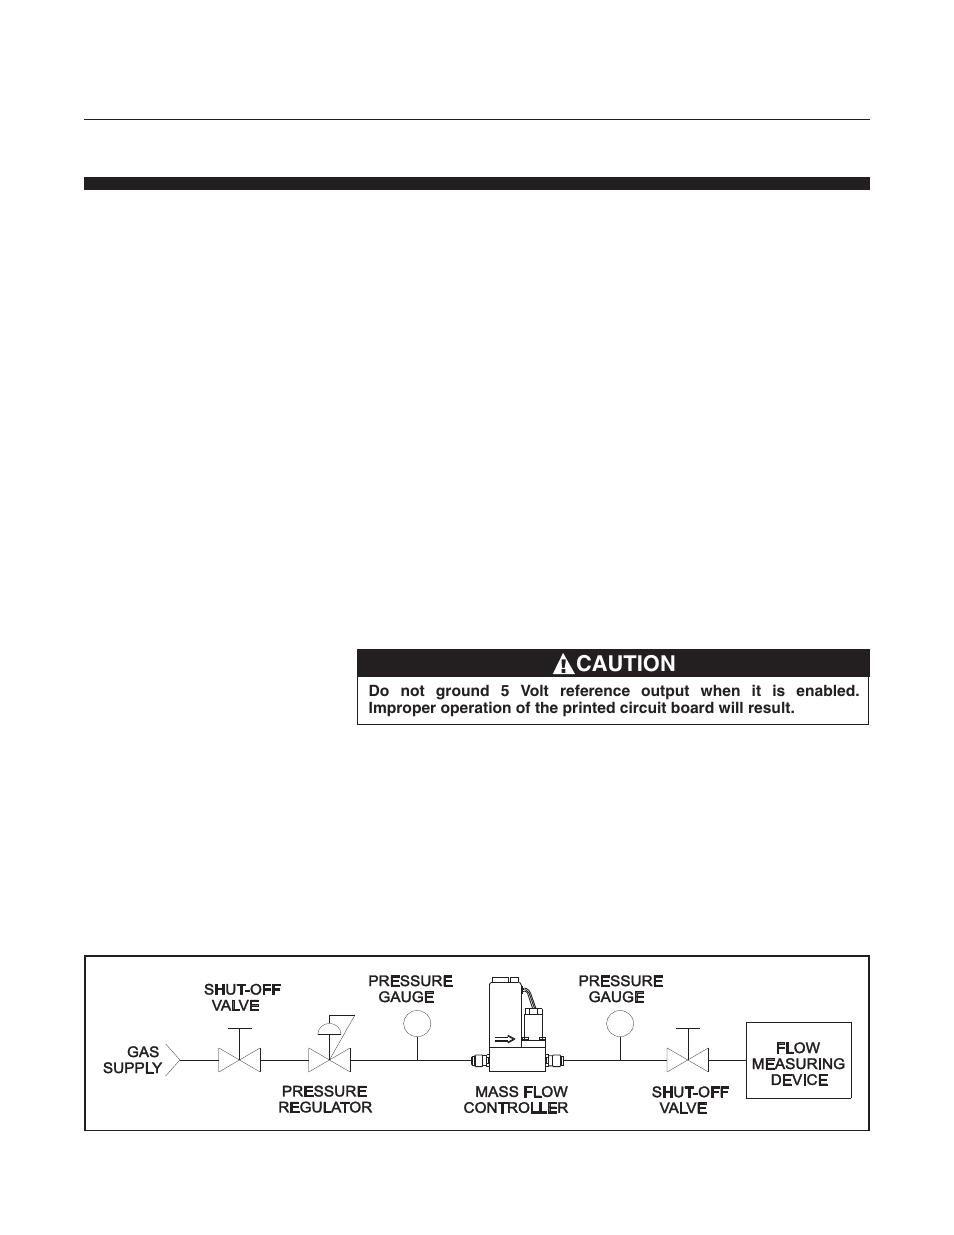 brooks caution brooks instrument 5850em user manual page 41 rh manualsdir com Instruction Manual Book User Manual Template